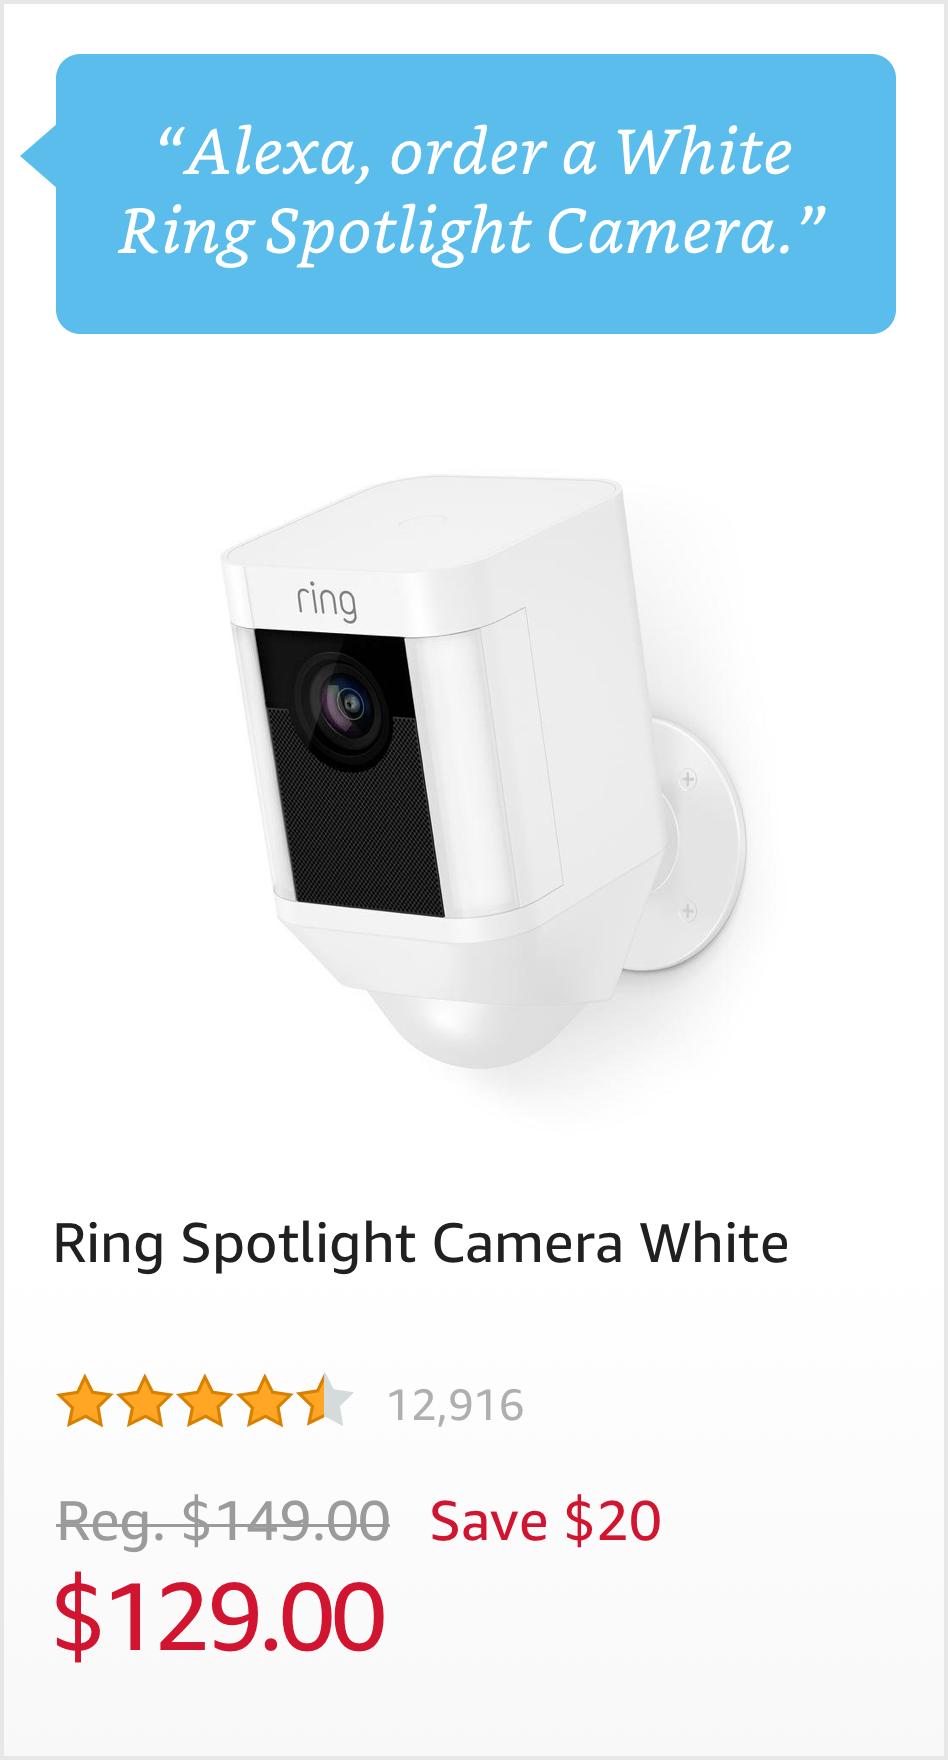 """Order a White Ring Spotlight Camera."" $129.00"